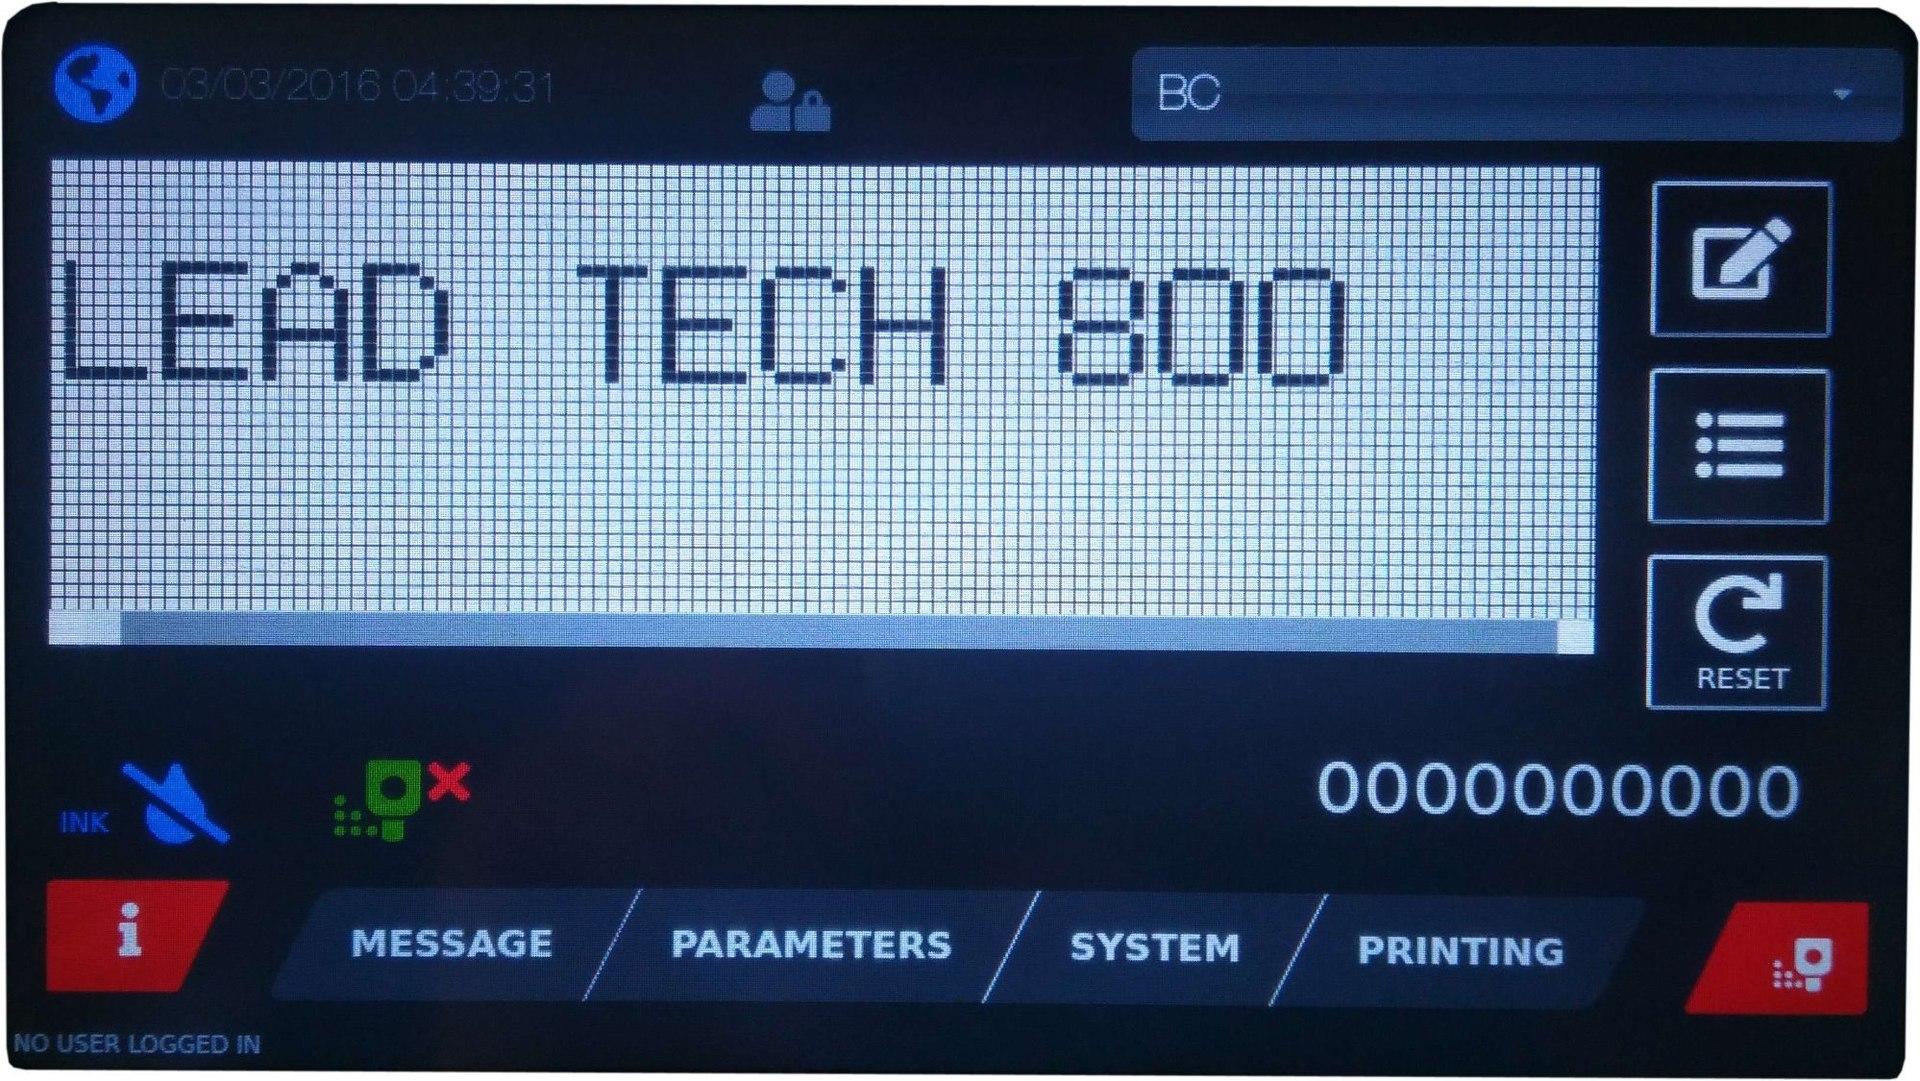 Lead Tech Lt800 Expiry Date Inkjet Printer